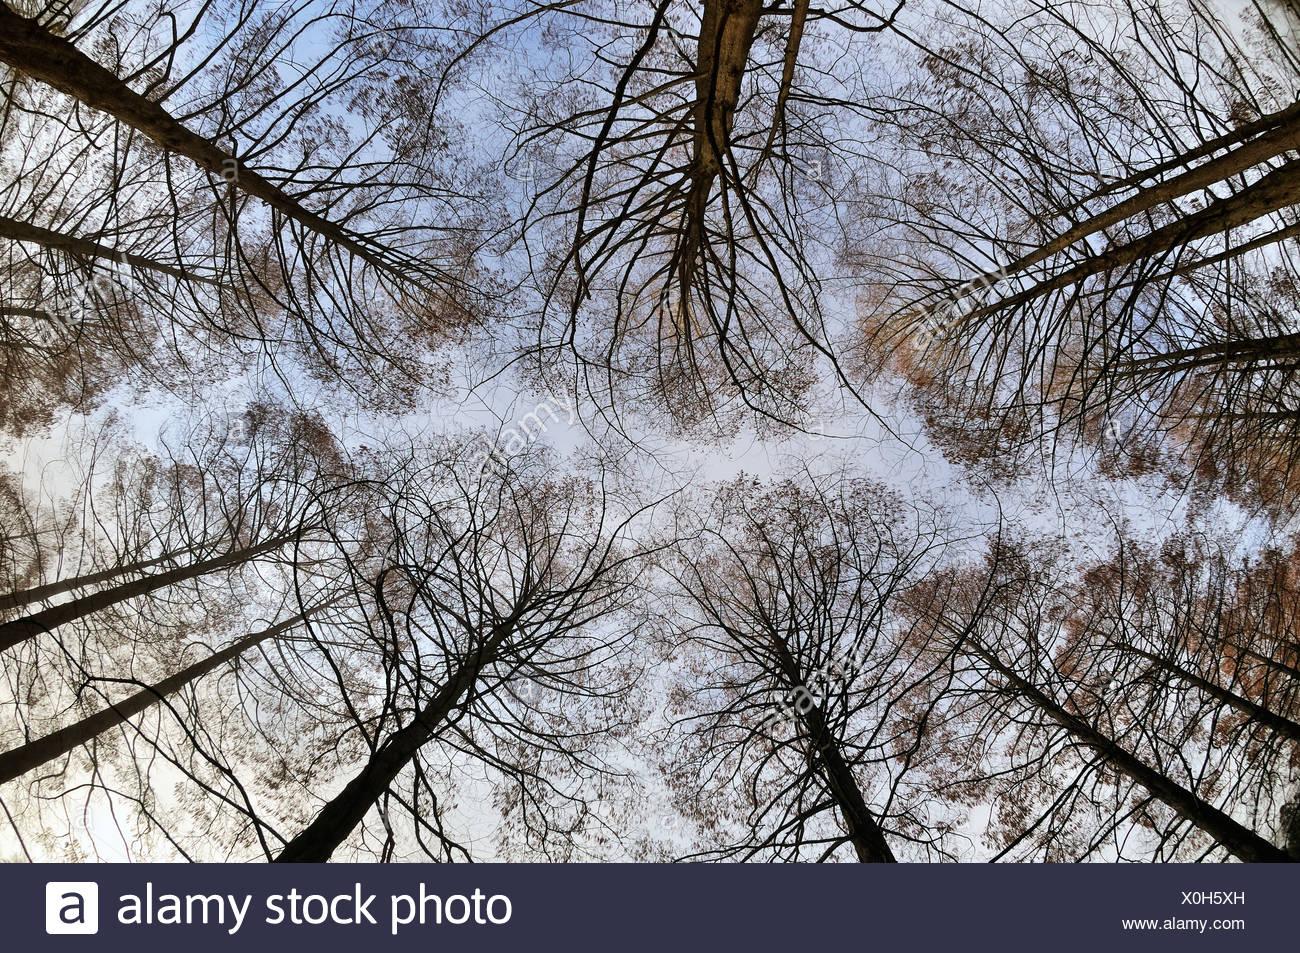 Dawn Redwoods (Metasequoia glyptostroboides) in winter, Germany, Europe - Stock Image